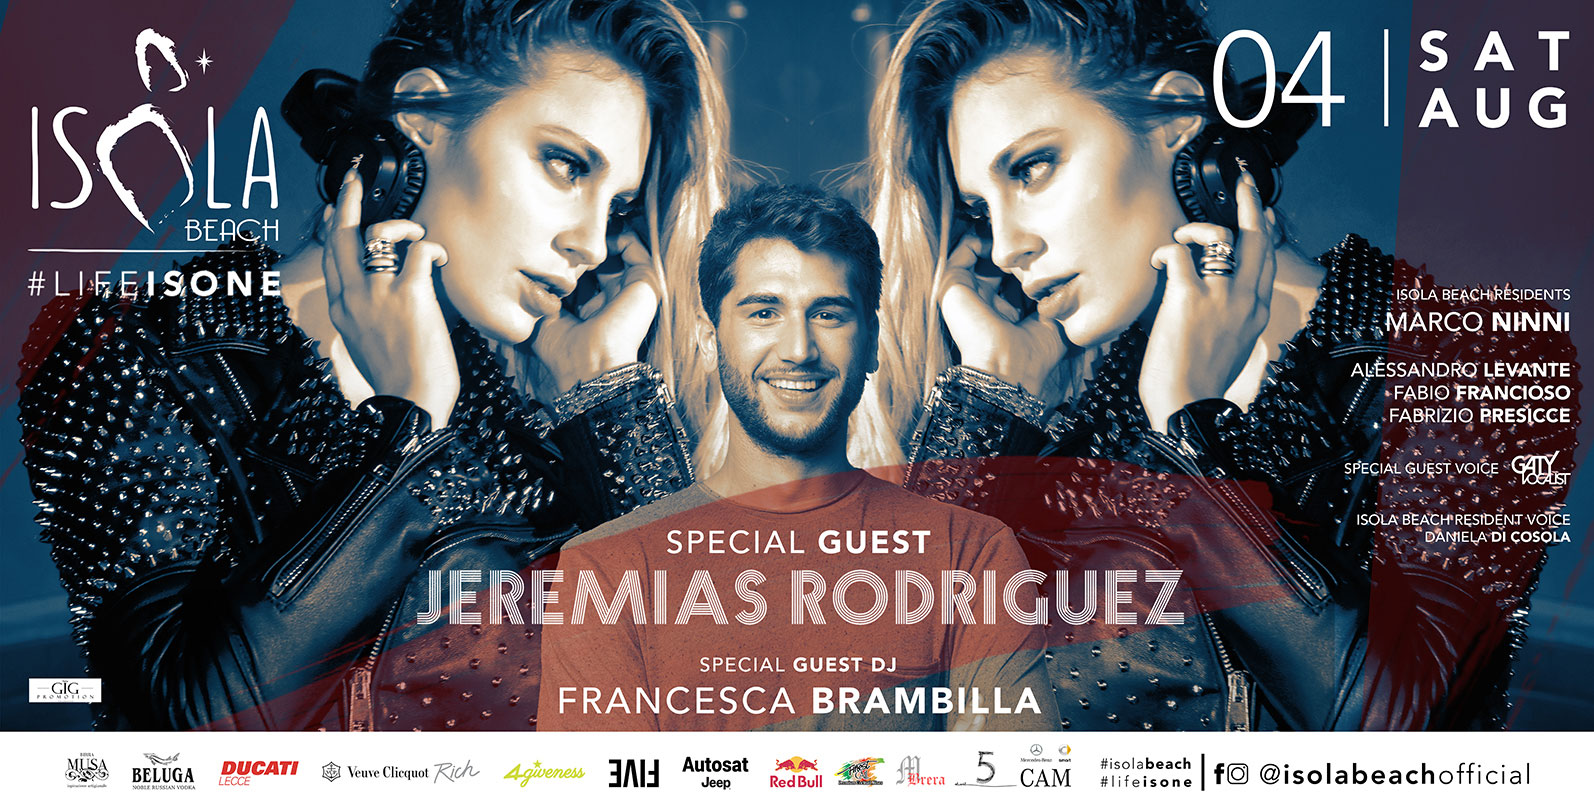 JEREMIAS RODRIGUEZ 04.08.18